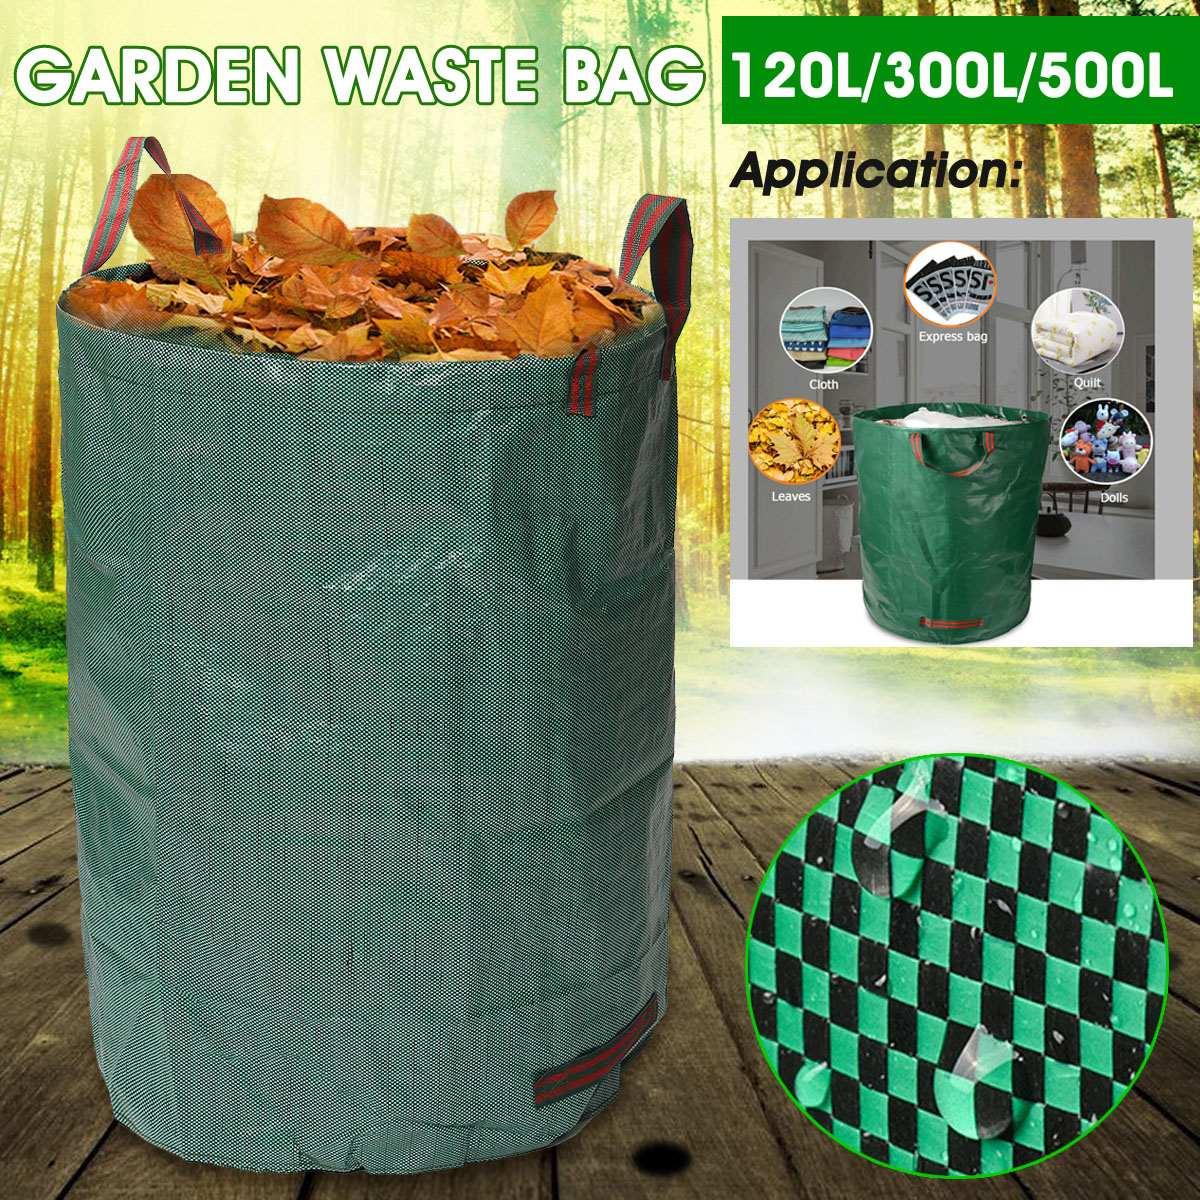 120L/300L/500L Garden Waste Bags Refuse Rubbish Grass Large Holder Bag Case Sack Heavy Duty Bin Home Toys Clothing Storage Yard